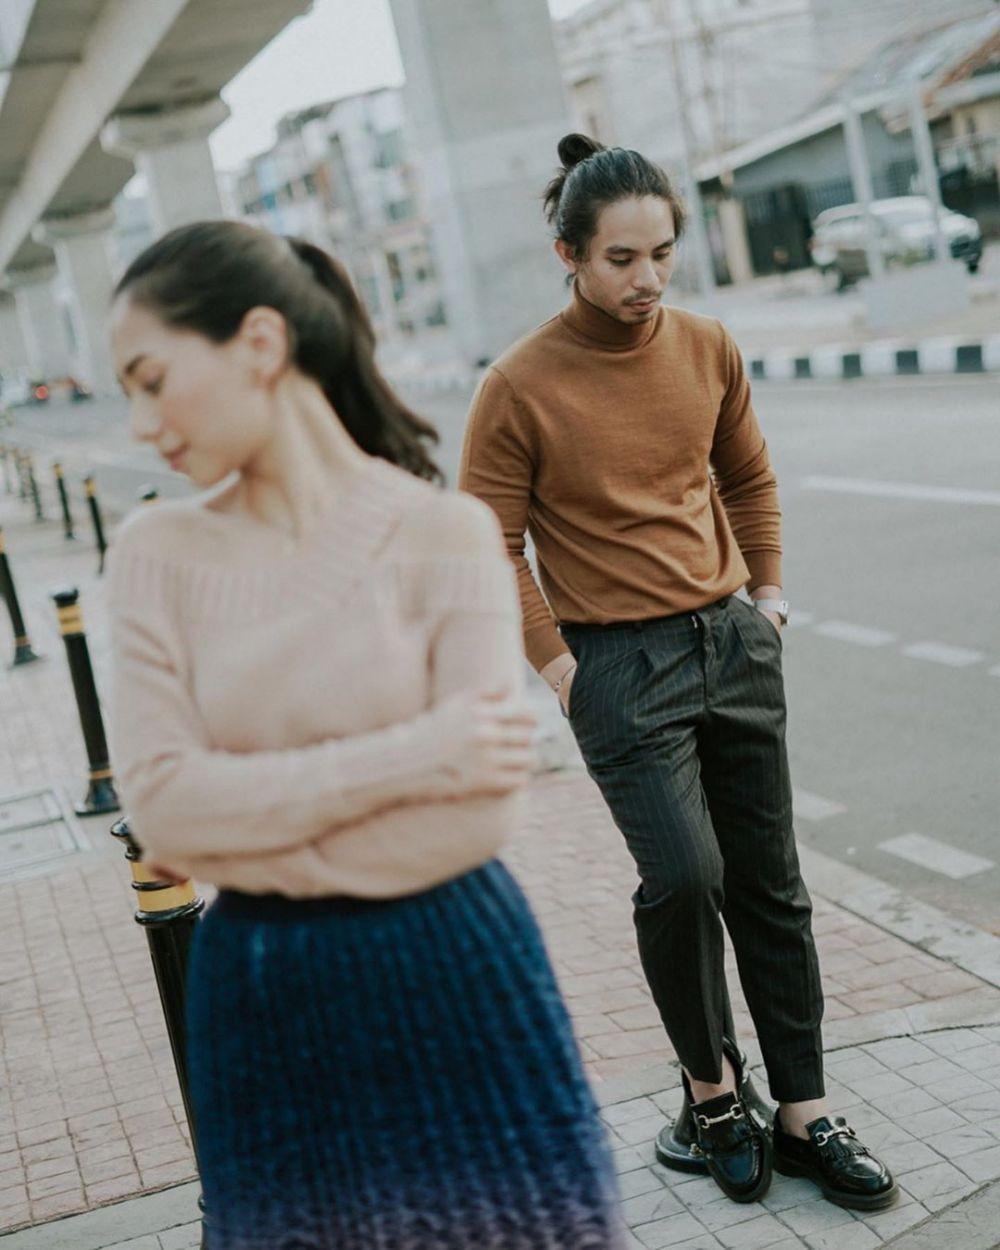 10 Ide Foto Prewedding ala Abel Cantika, Klasik hingga Street Style